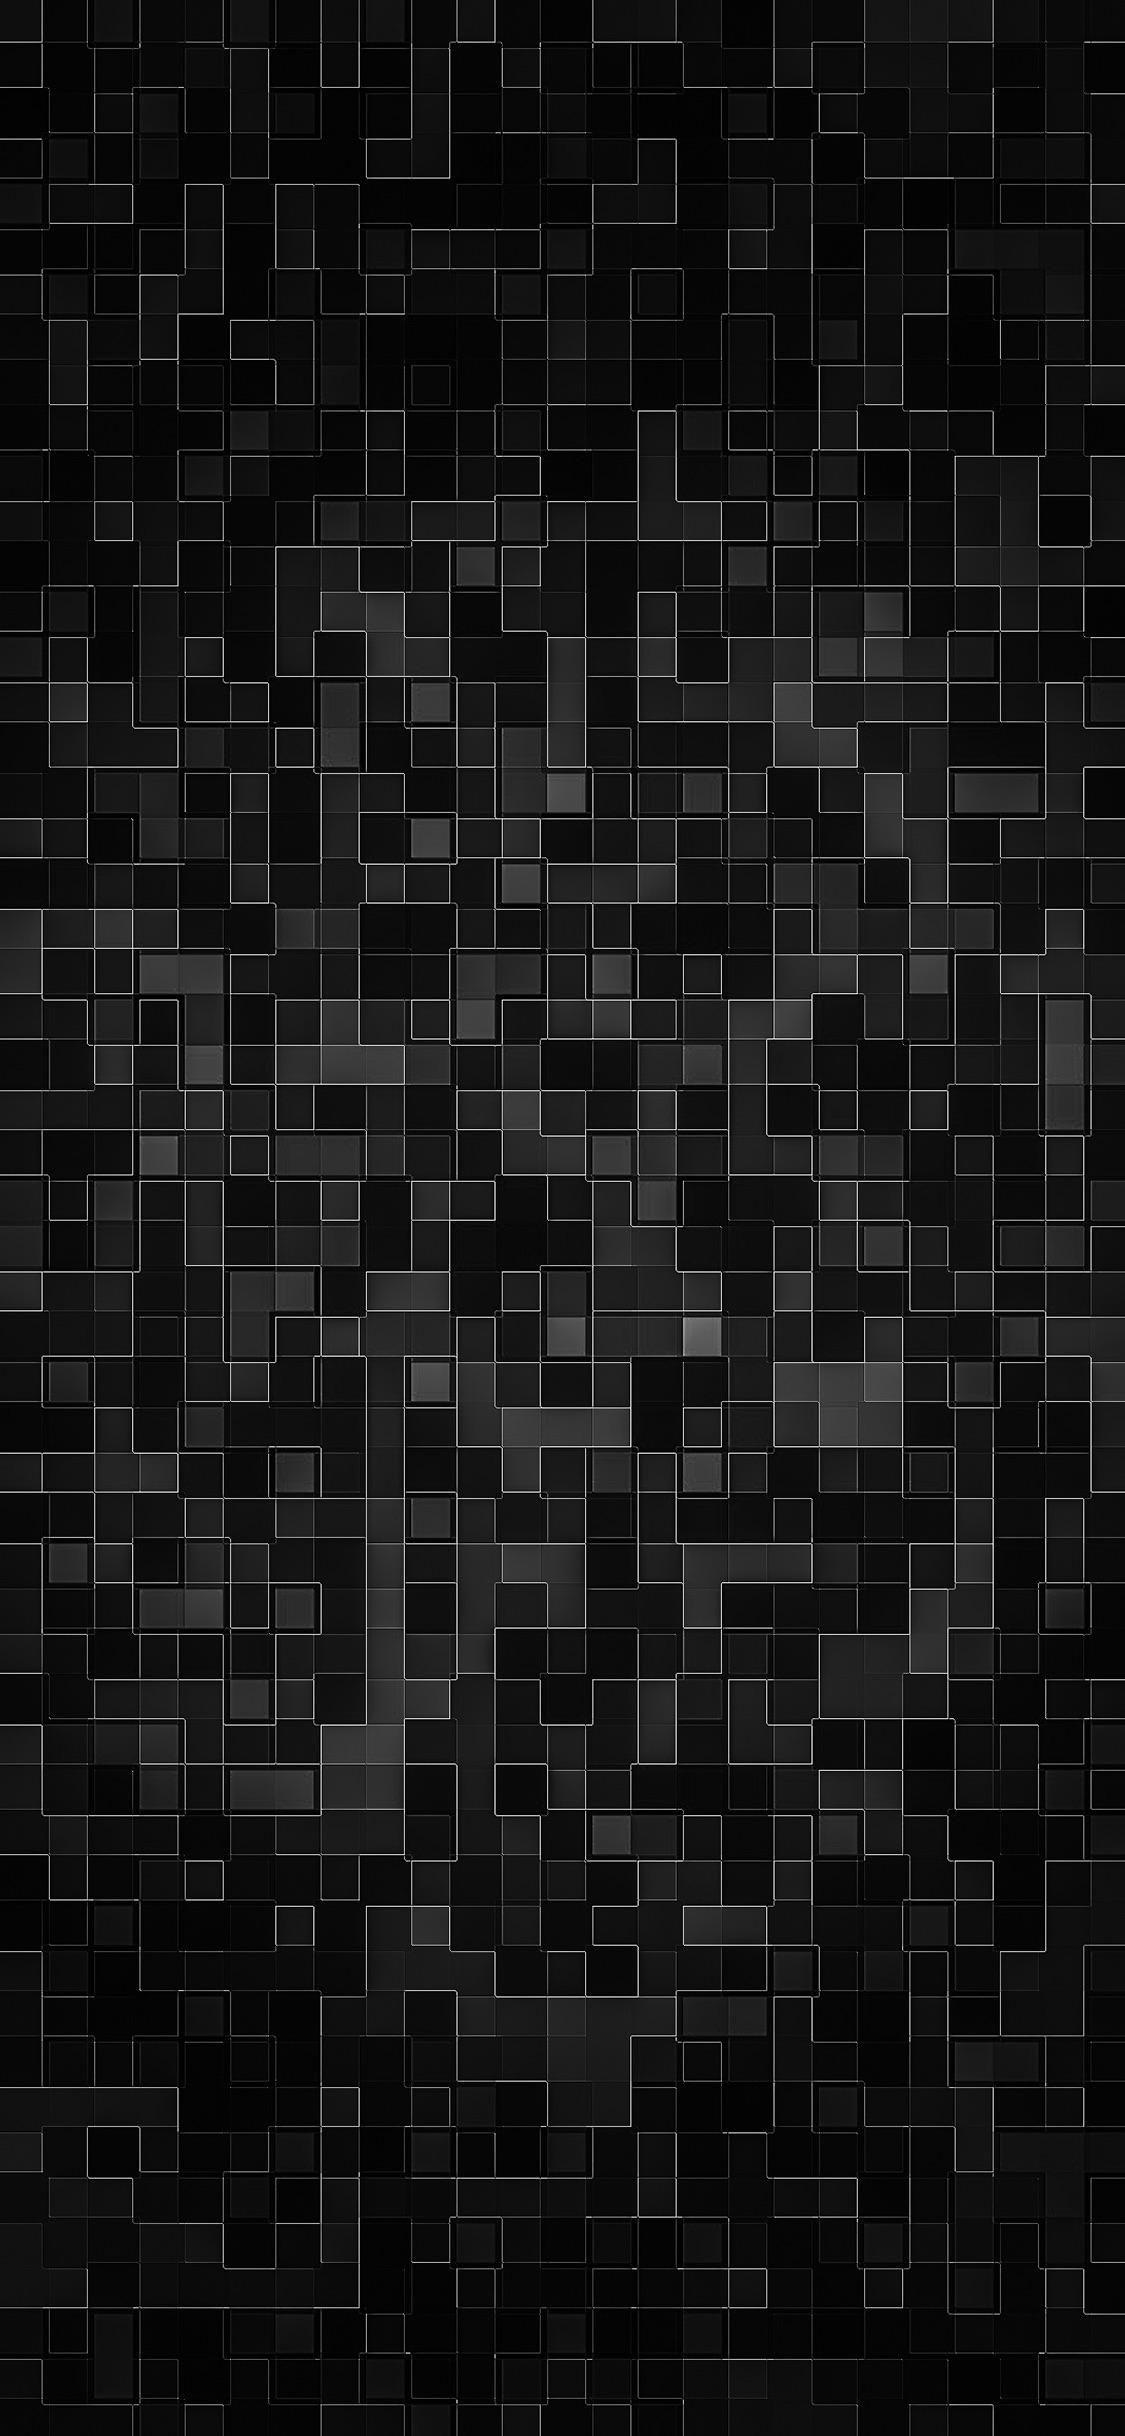 Dark Mosiac Abstract Wallpaper Wallpaper Diy Crafts Iphone Wallpaper Hd Original